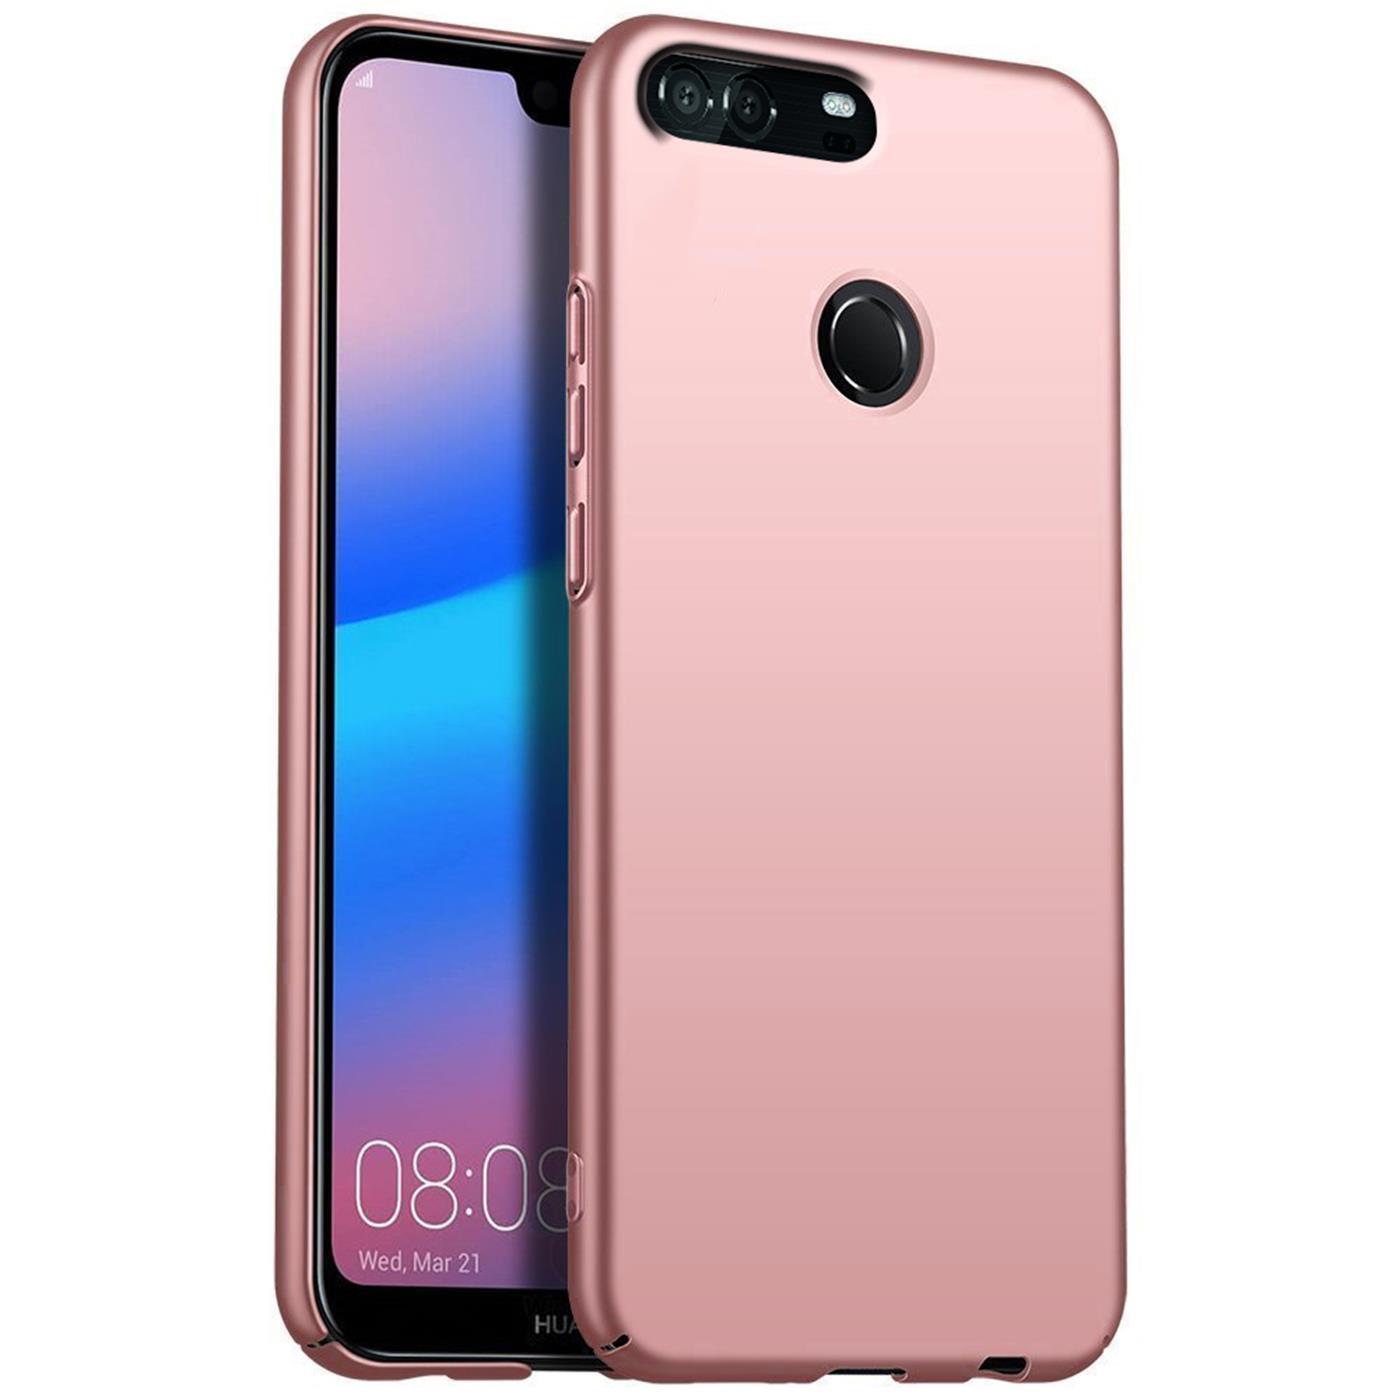 Hard-Back-Case-Cover-Huawei-p10-duenn-Cover-Slim-Shockproof-Rugged Indexbild 18